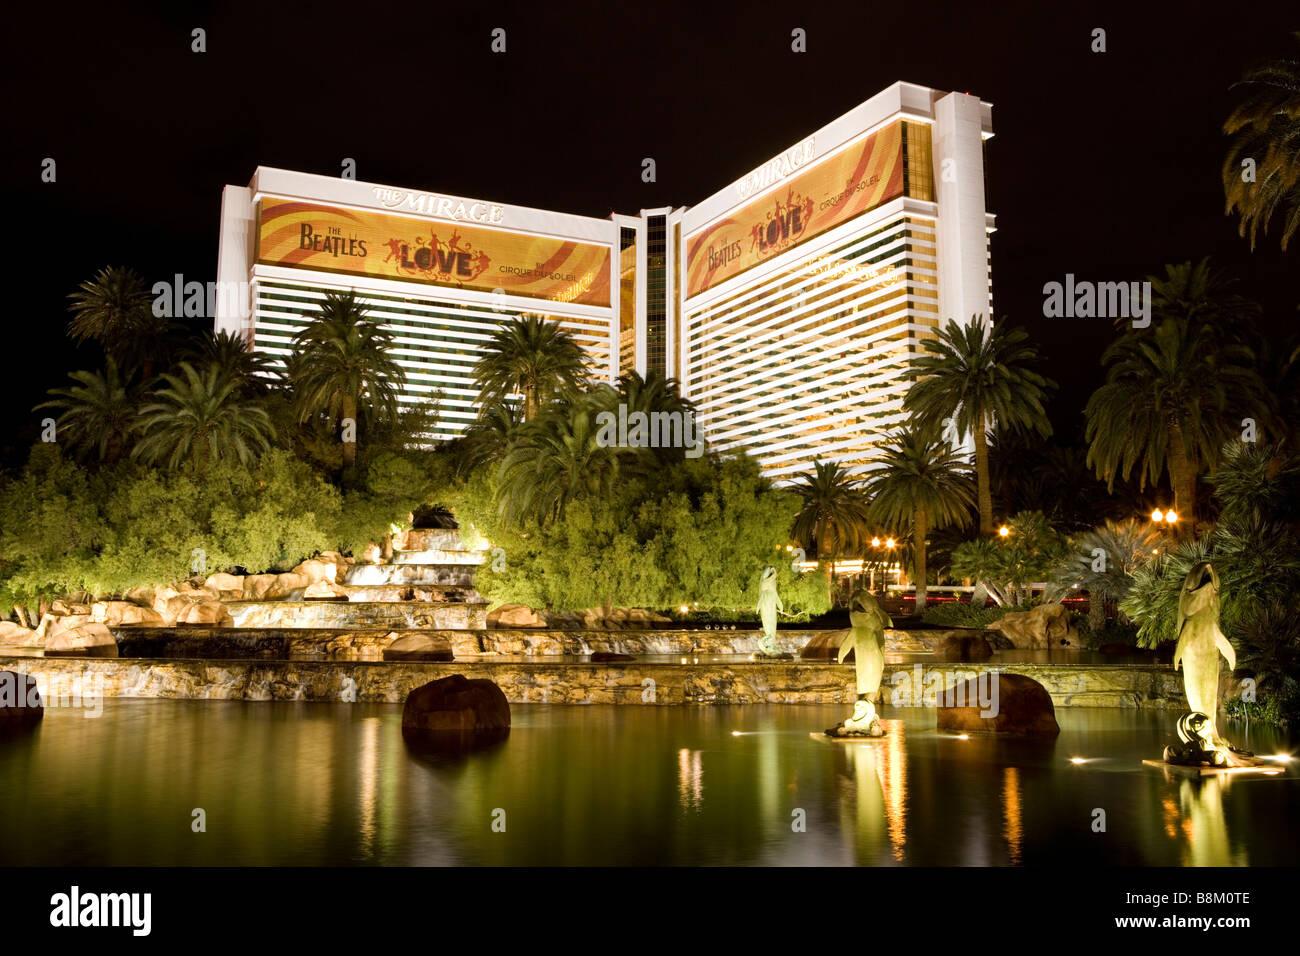 Mirage Hotel And Casino Stock Photos & Mirage Hotel And Casino Stock ...